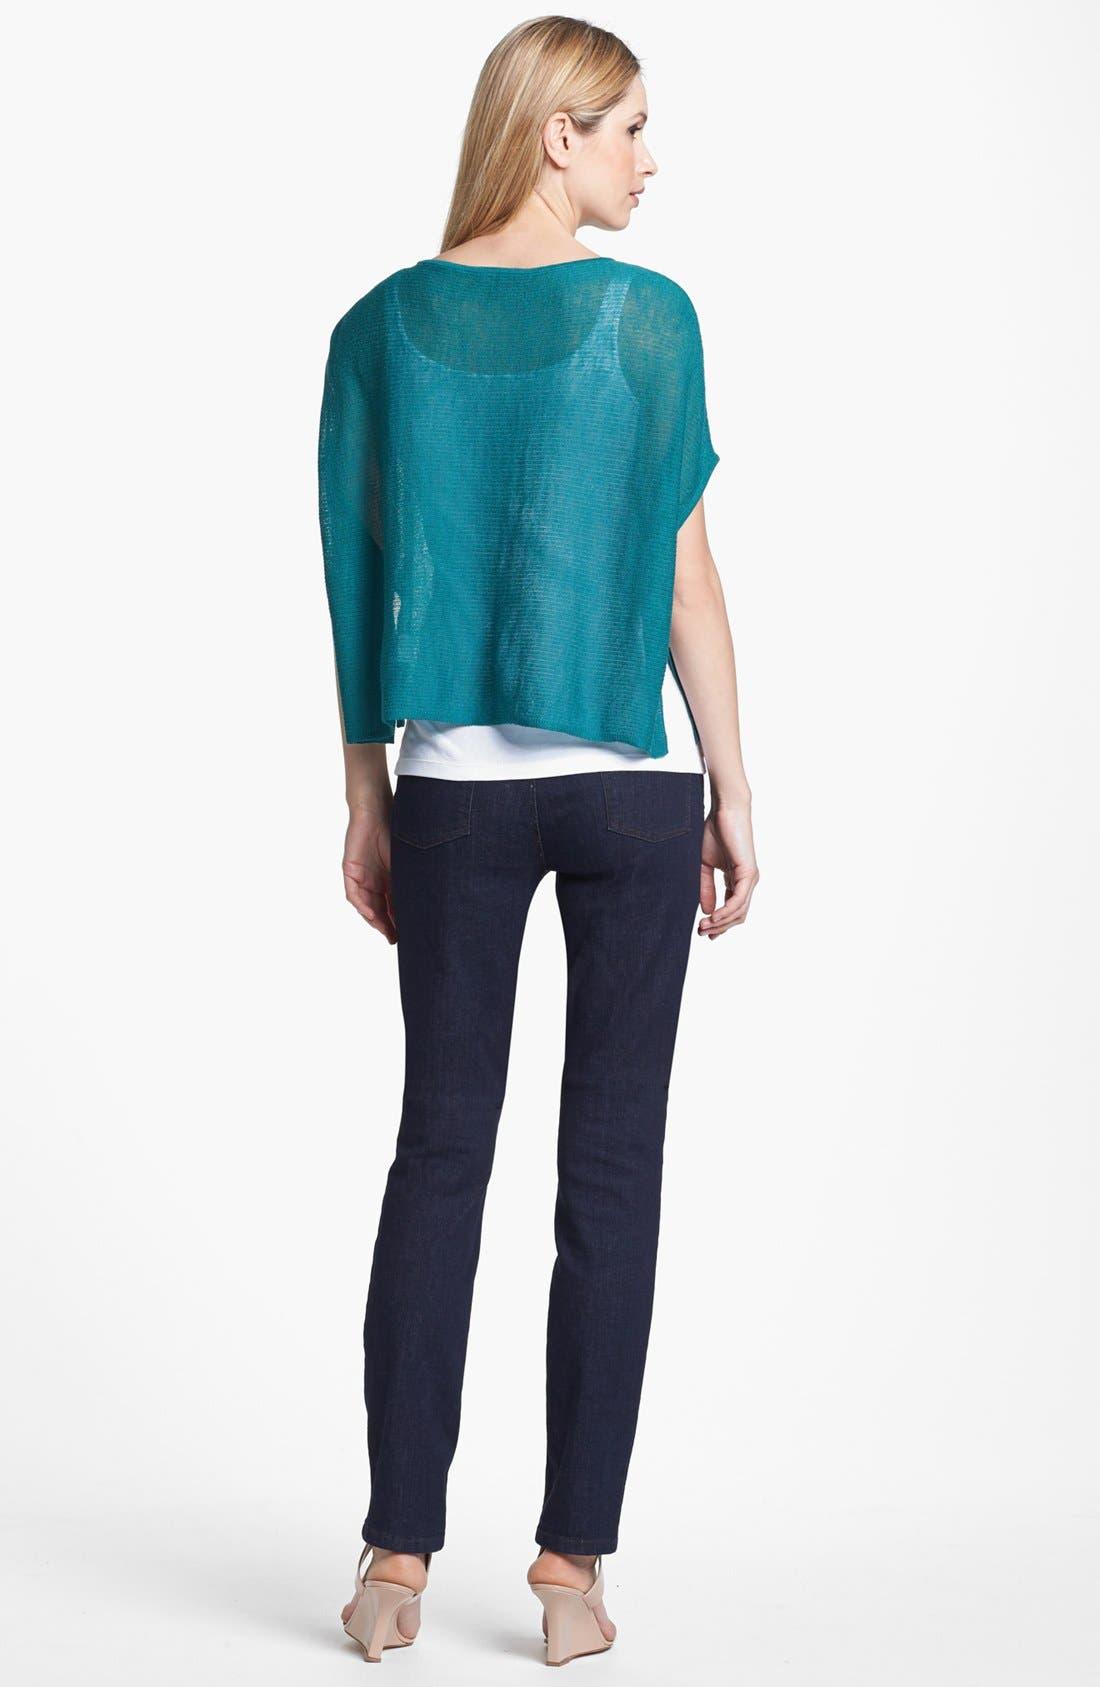 Alternate Image 3  - Eileen Fisher 'Ethereal Wool' Short Poncho Top (Regular & Petite)